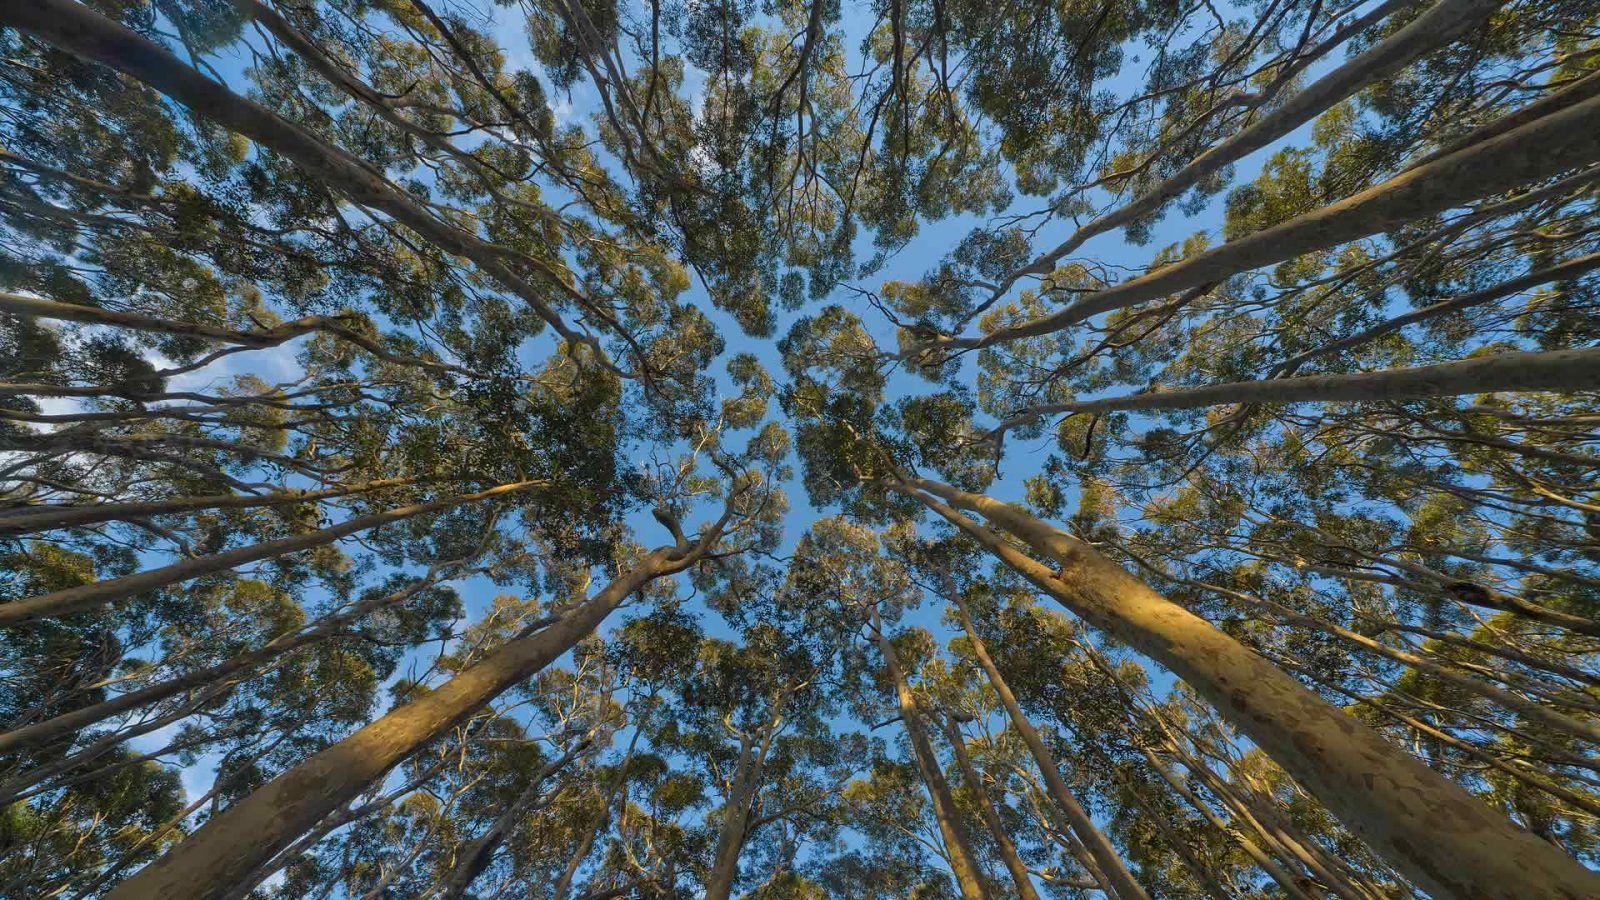 Eucalyptus Desktop Wallpapers Top Free Eucalyptus Desktop Backgrounds Wallpaperaccess